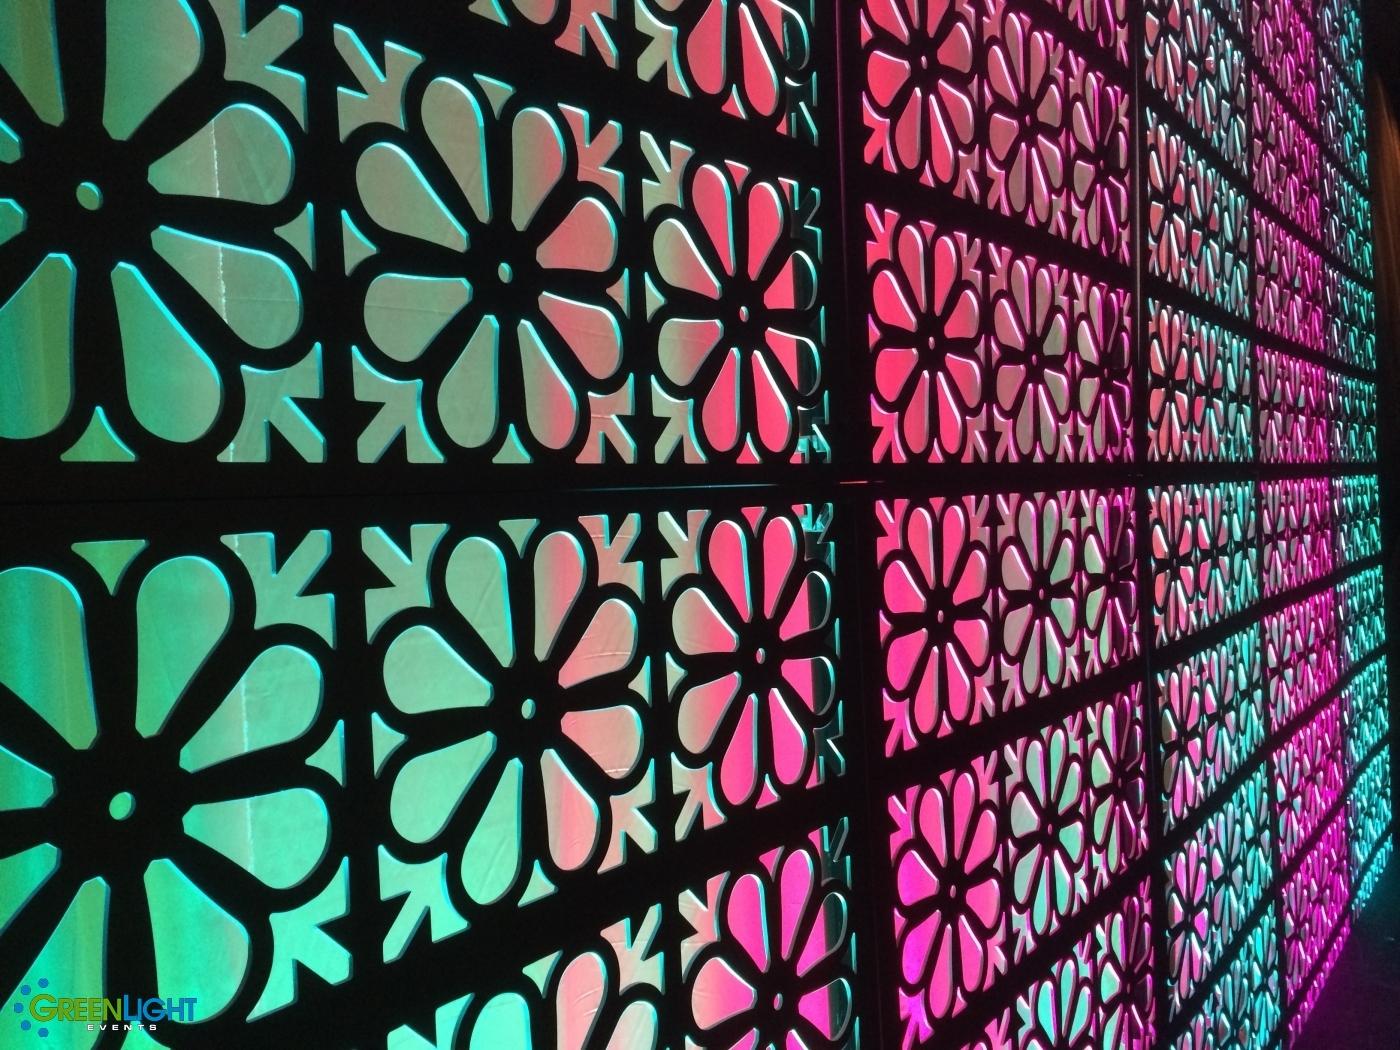 Custom backdrop at Tulalip Casino by GreenLight Events